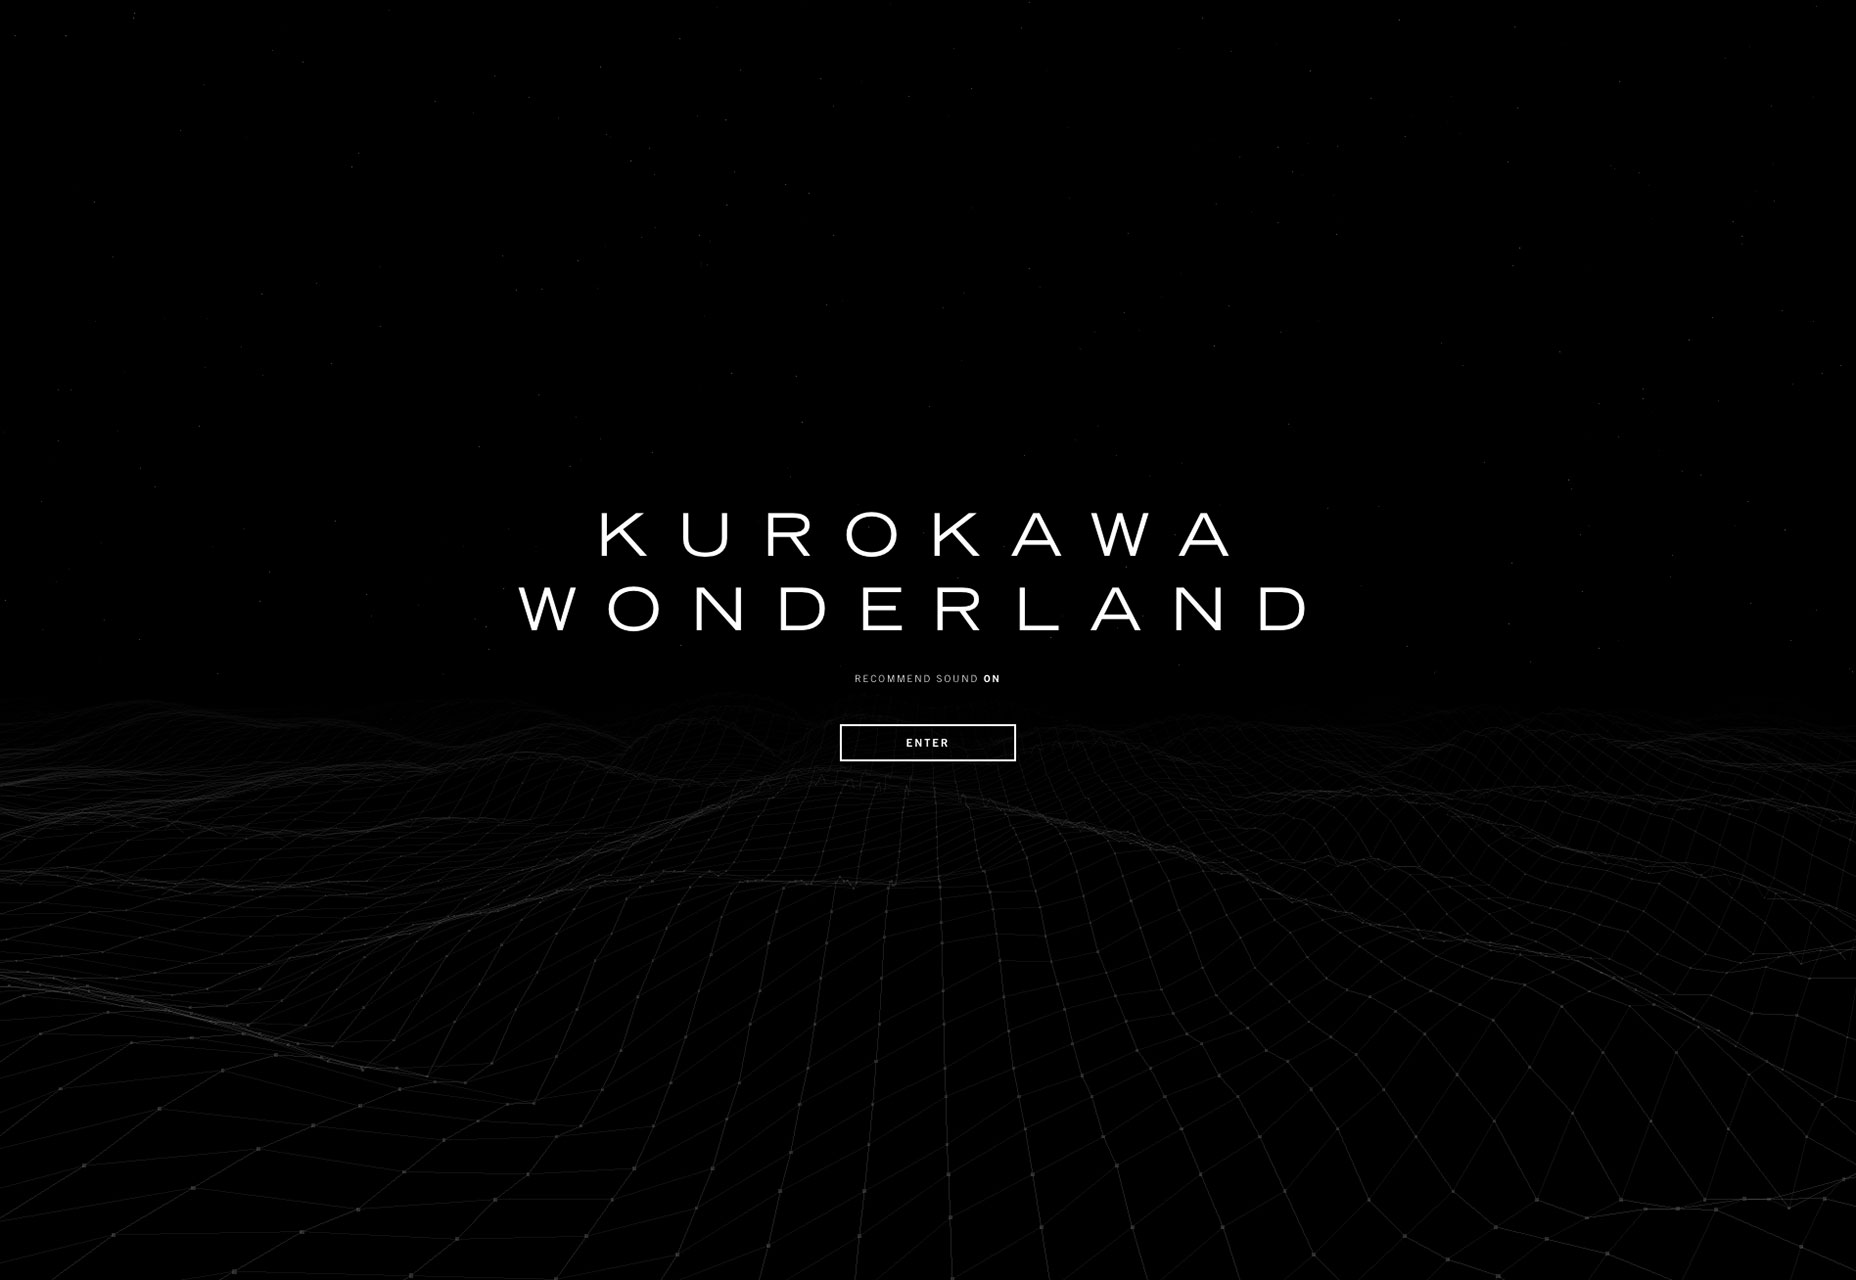 kurokawawonderland